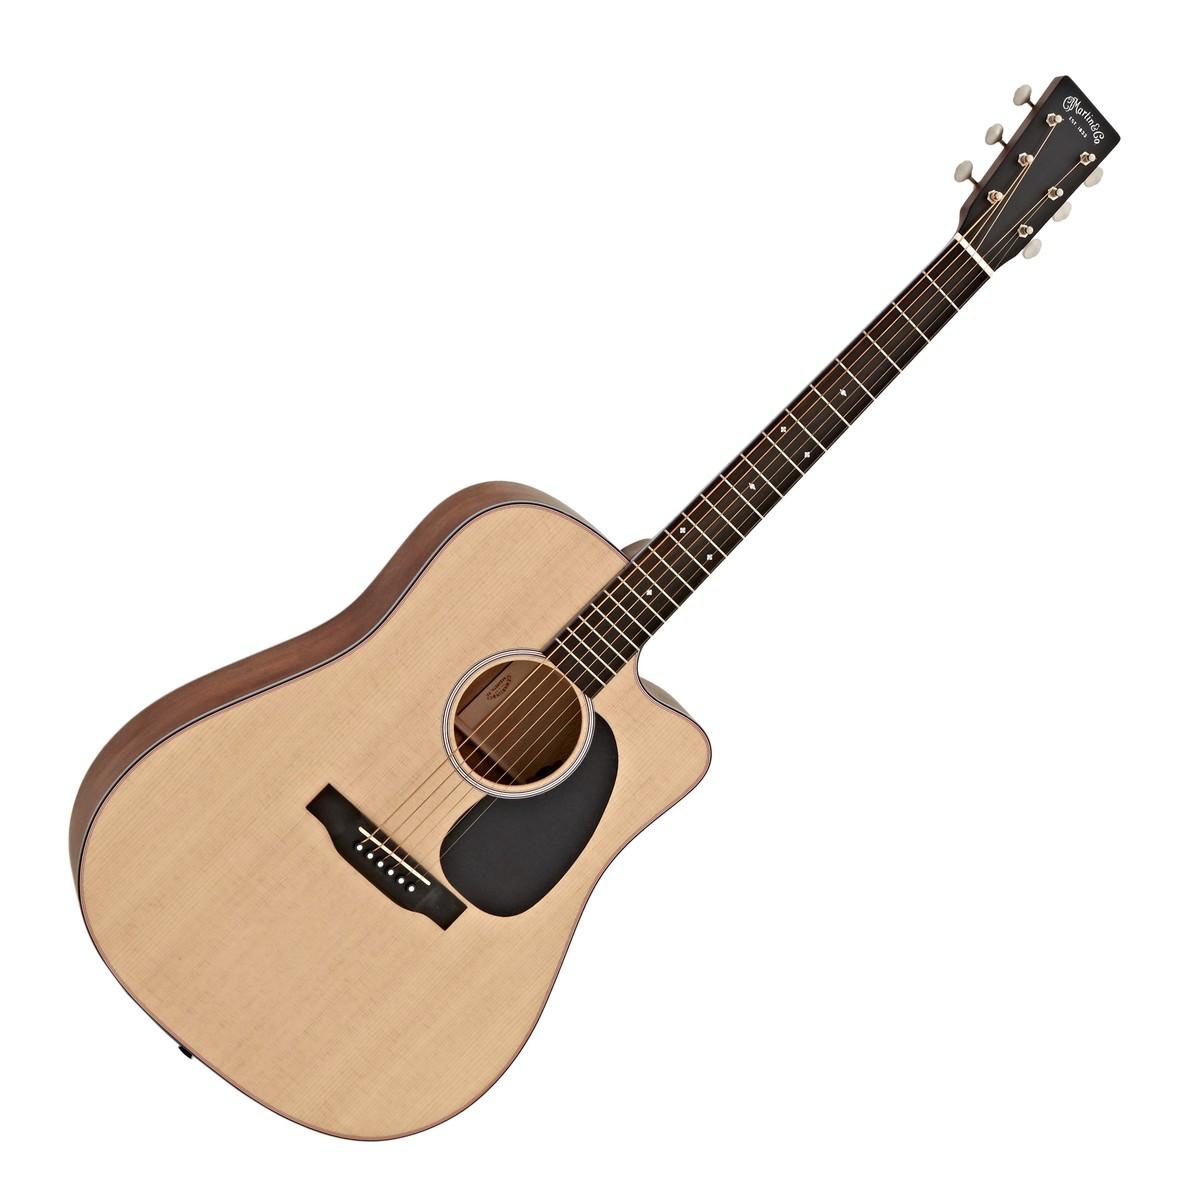 martin dc 16e electric acoustic guitar gear4music. Black Bedroom Furniture Sets. Home Design Ideas